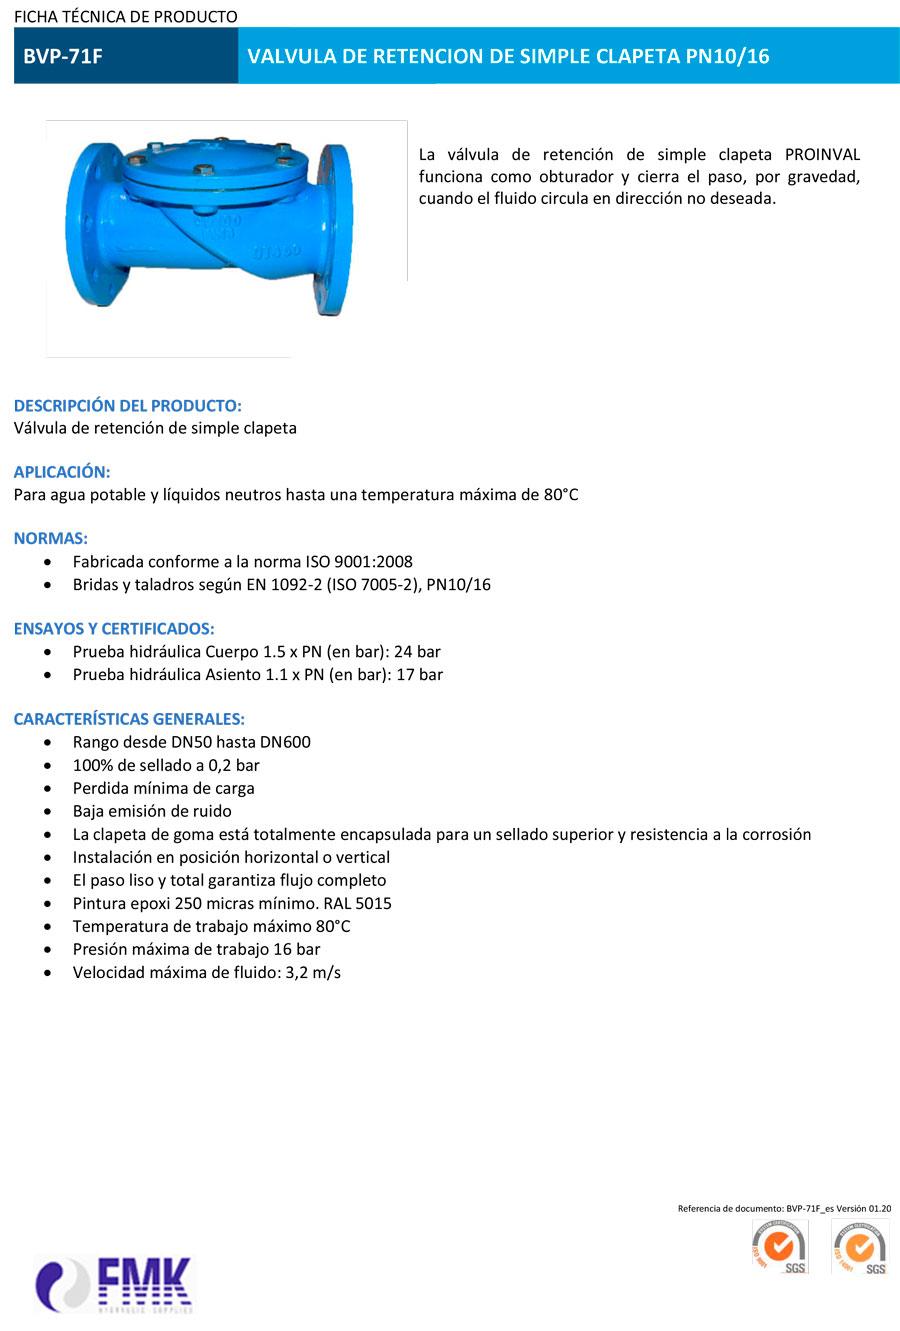 fmk-hydraulic-valvula-de-retencion-de-simple-clapeta-corta-BVP-71F-ficha-tecnica-1